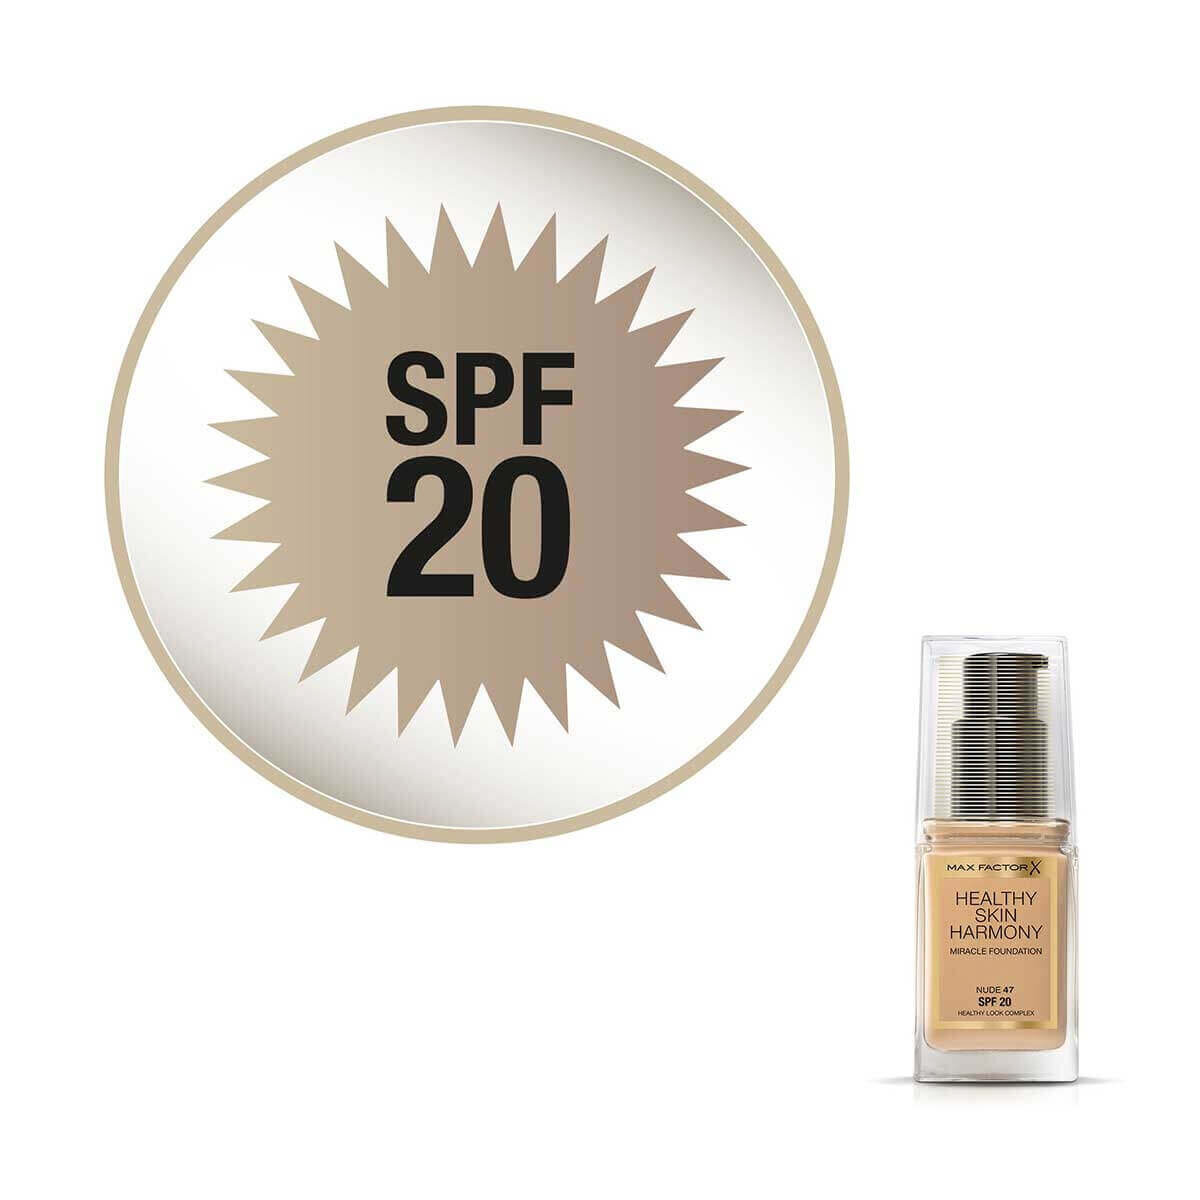 Healthy Skin Harmony Fondöten 47 Nude